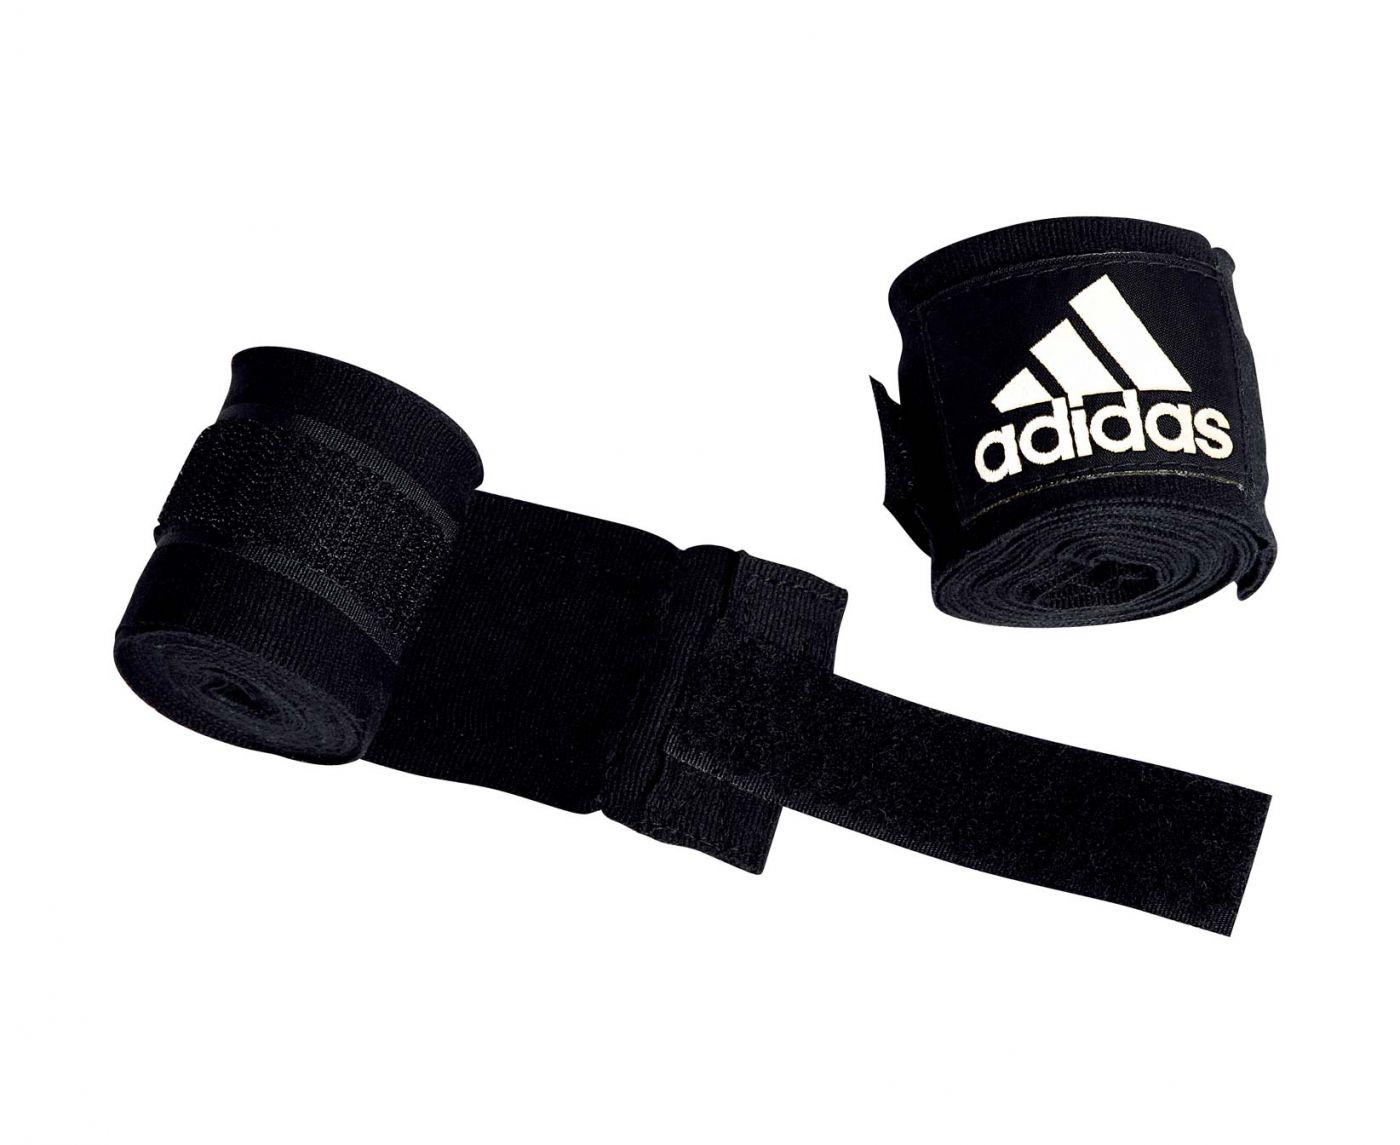 Бинты эластичные Adidas AIBA New Rules Boxing Crepe Bandage чёрные, 3.5м, adiBP031